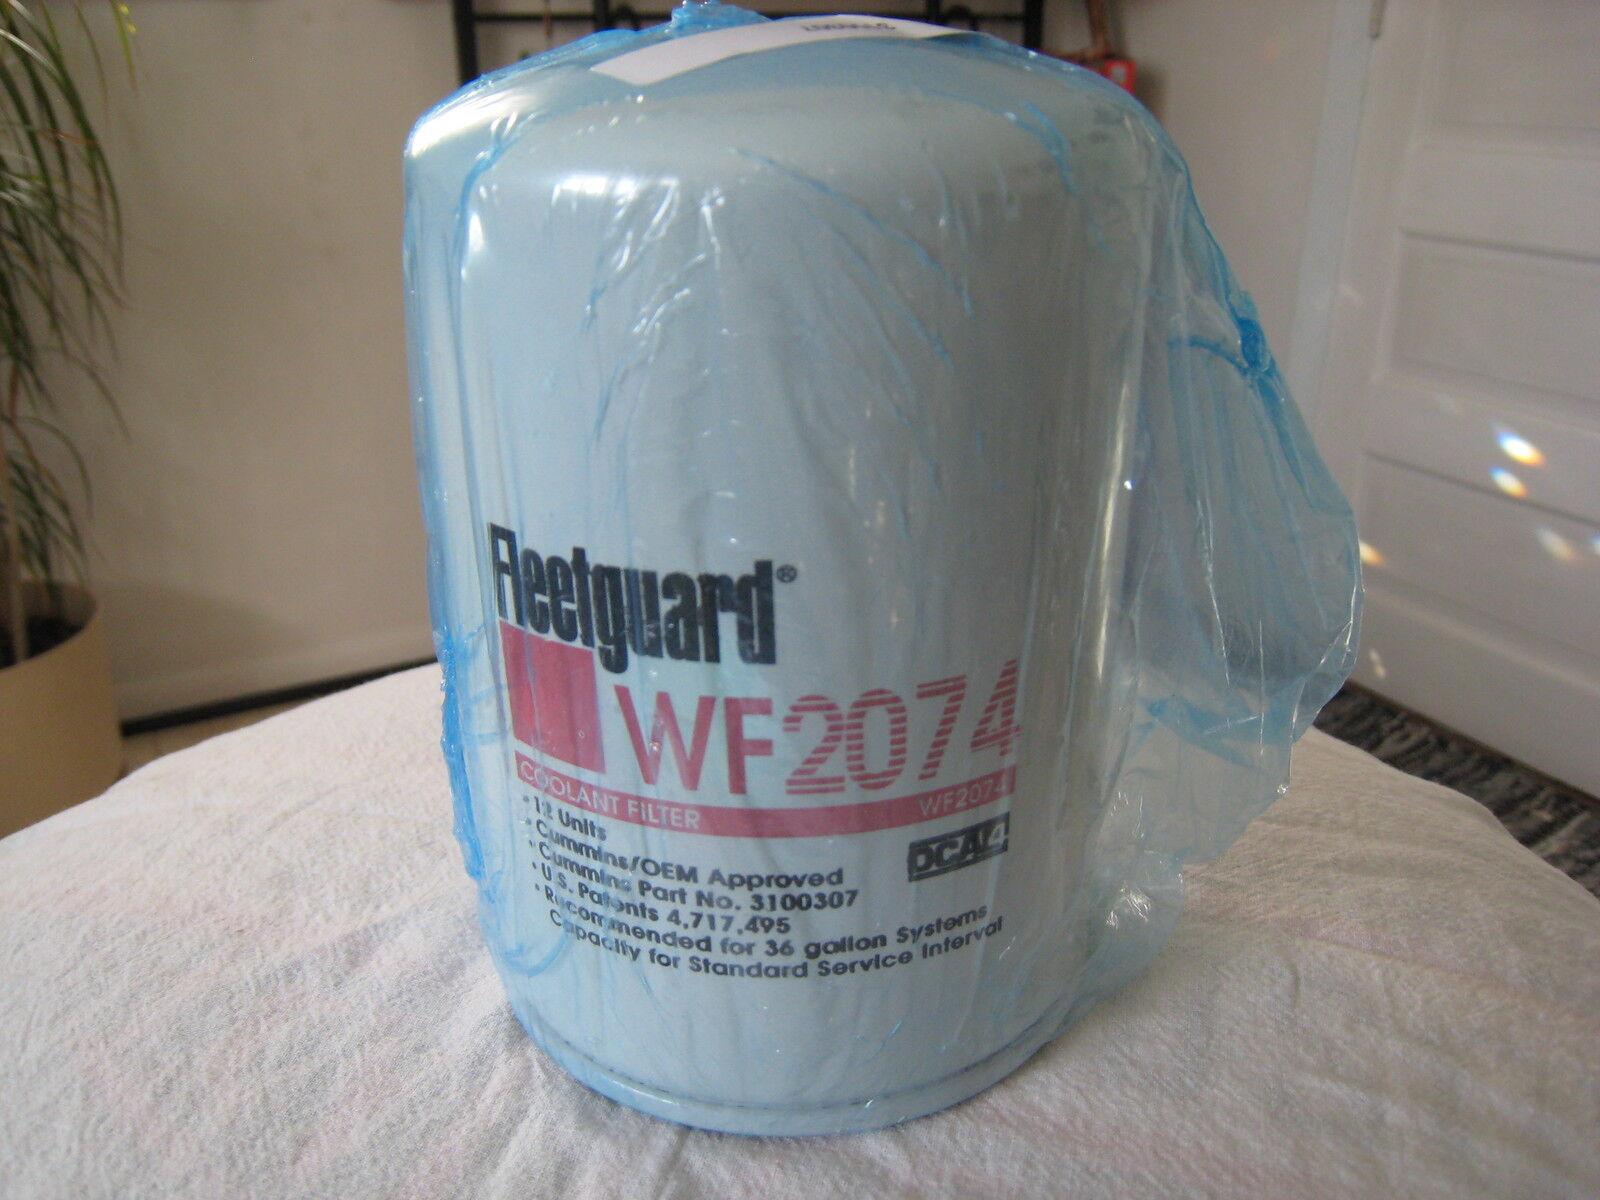 Fleetguard WF2074 filters